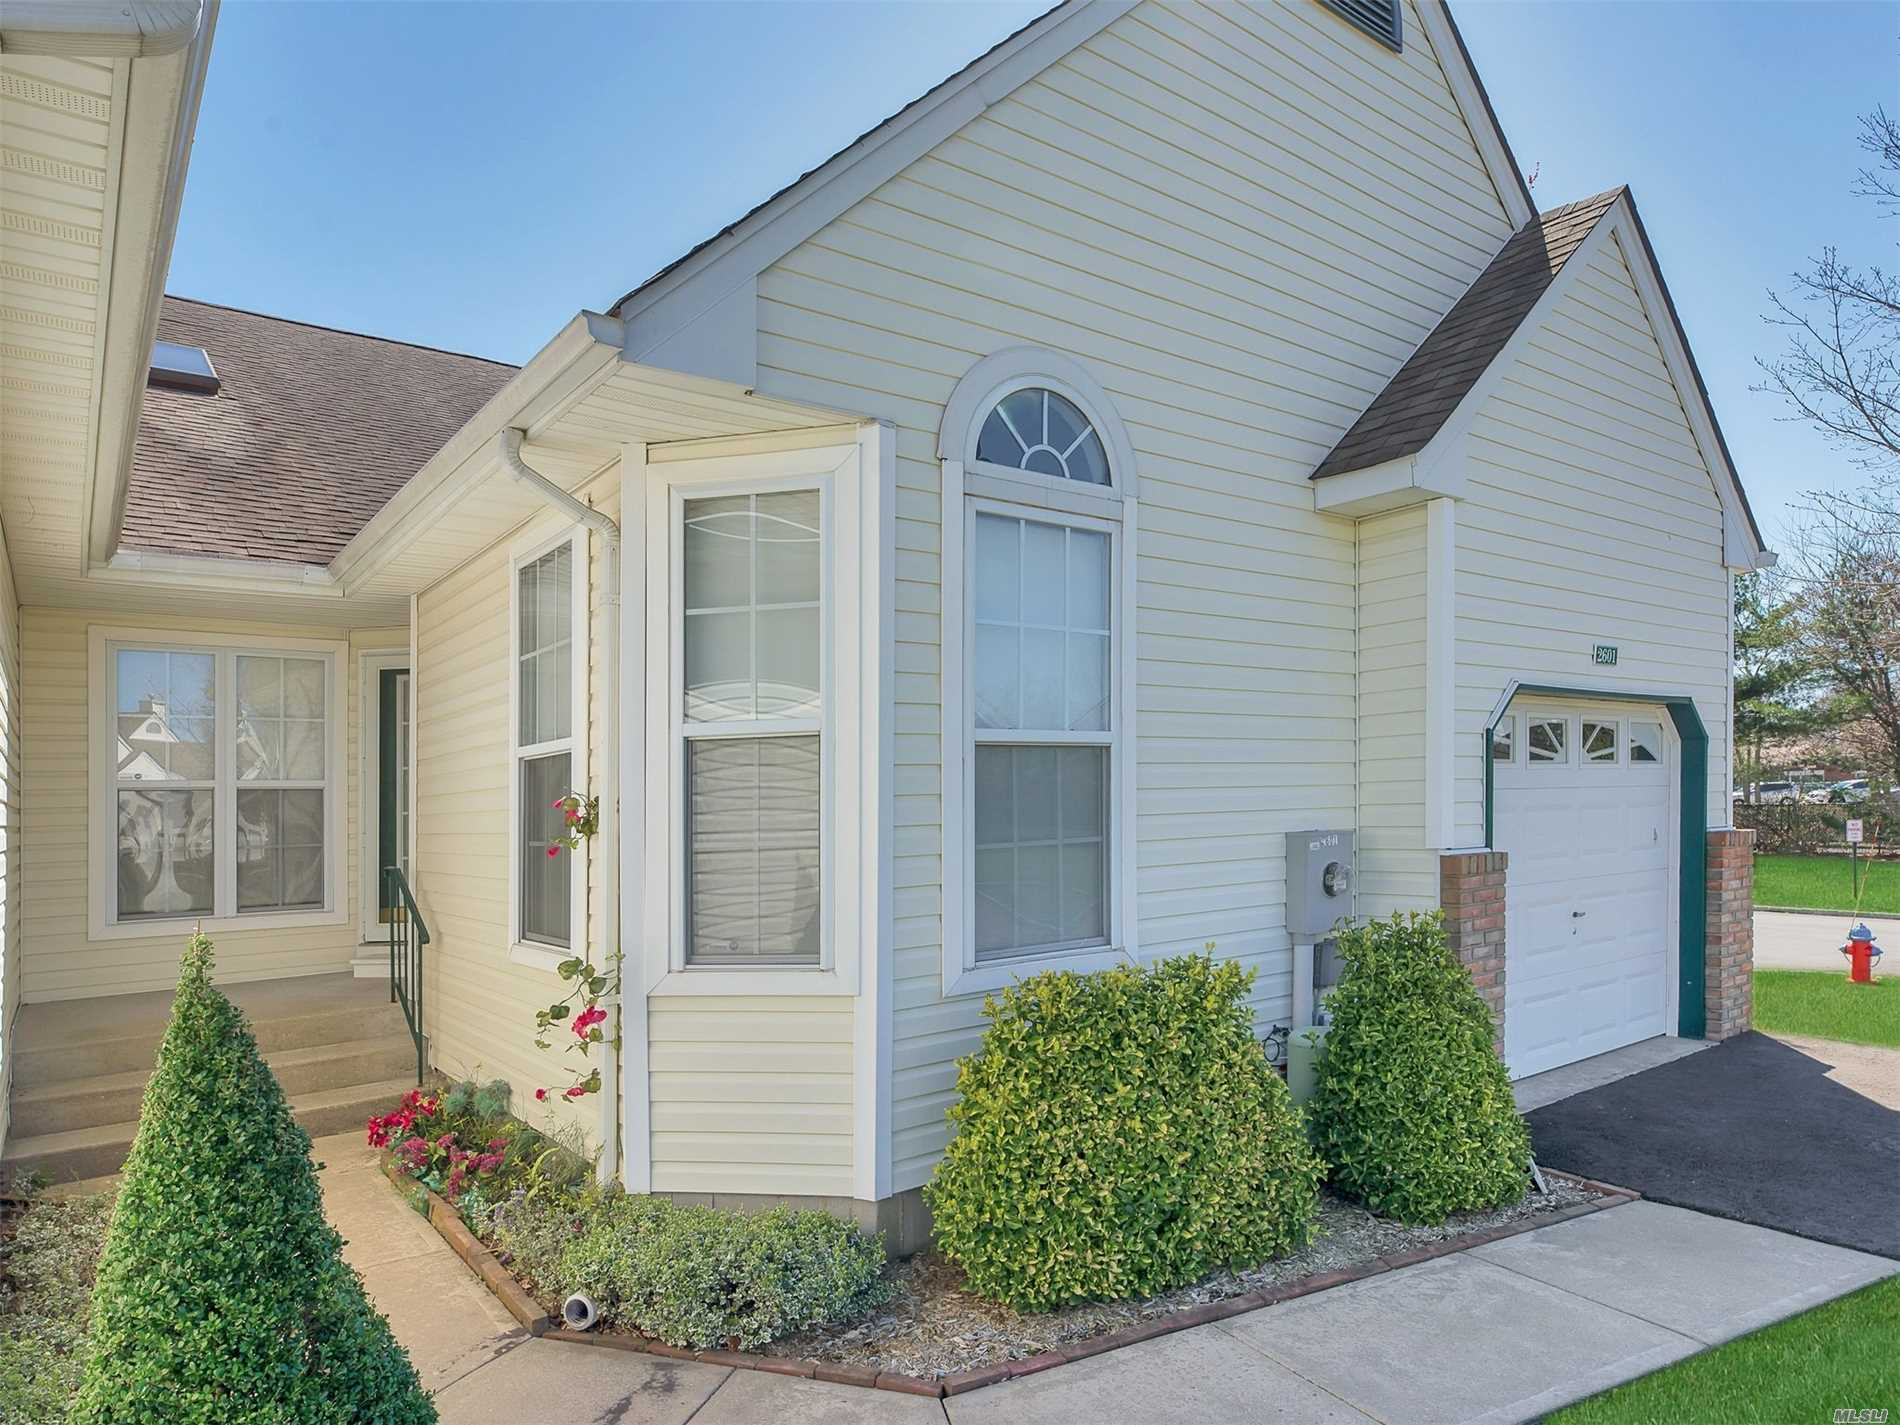 Property for sale at 2601 Eve Ann Drive, Pt.Jefferson Sta NY 11776, Pt.Jefferson Sta,  New York 11776